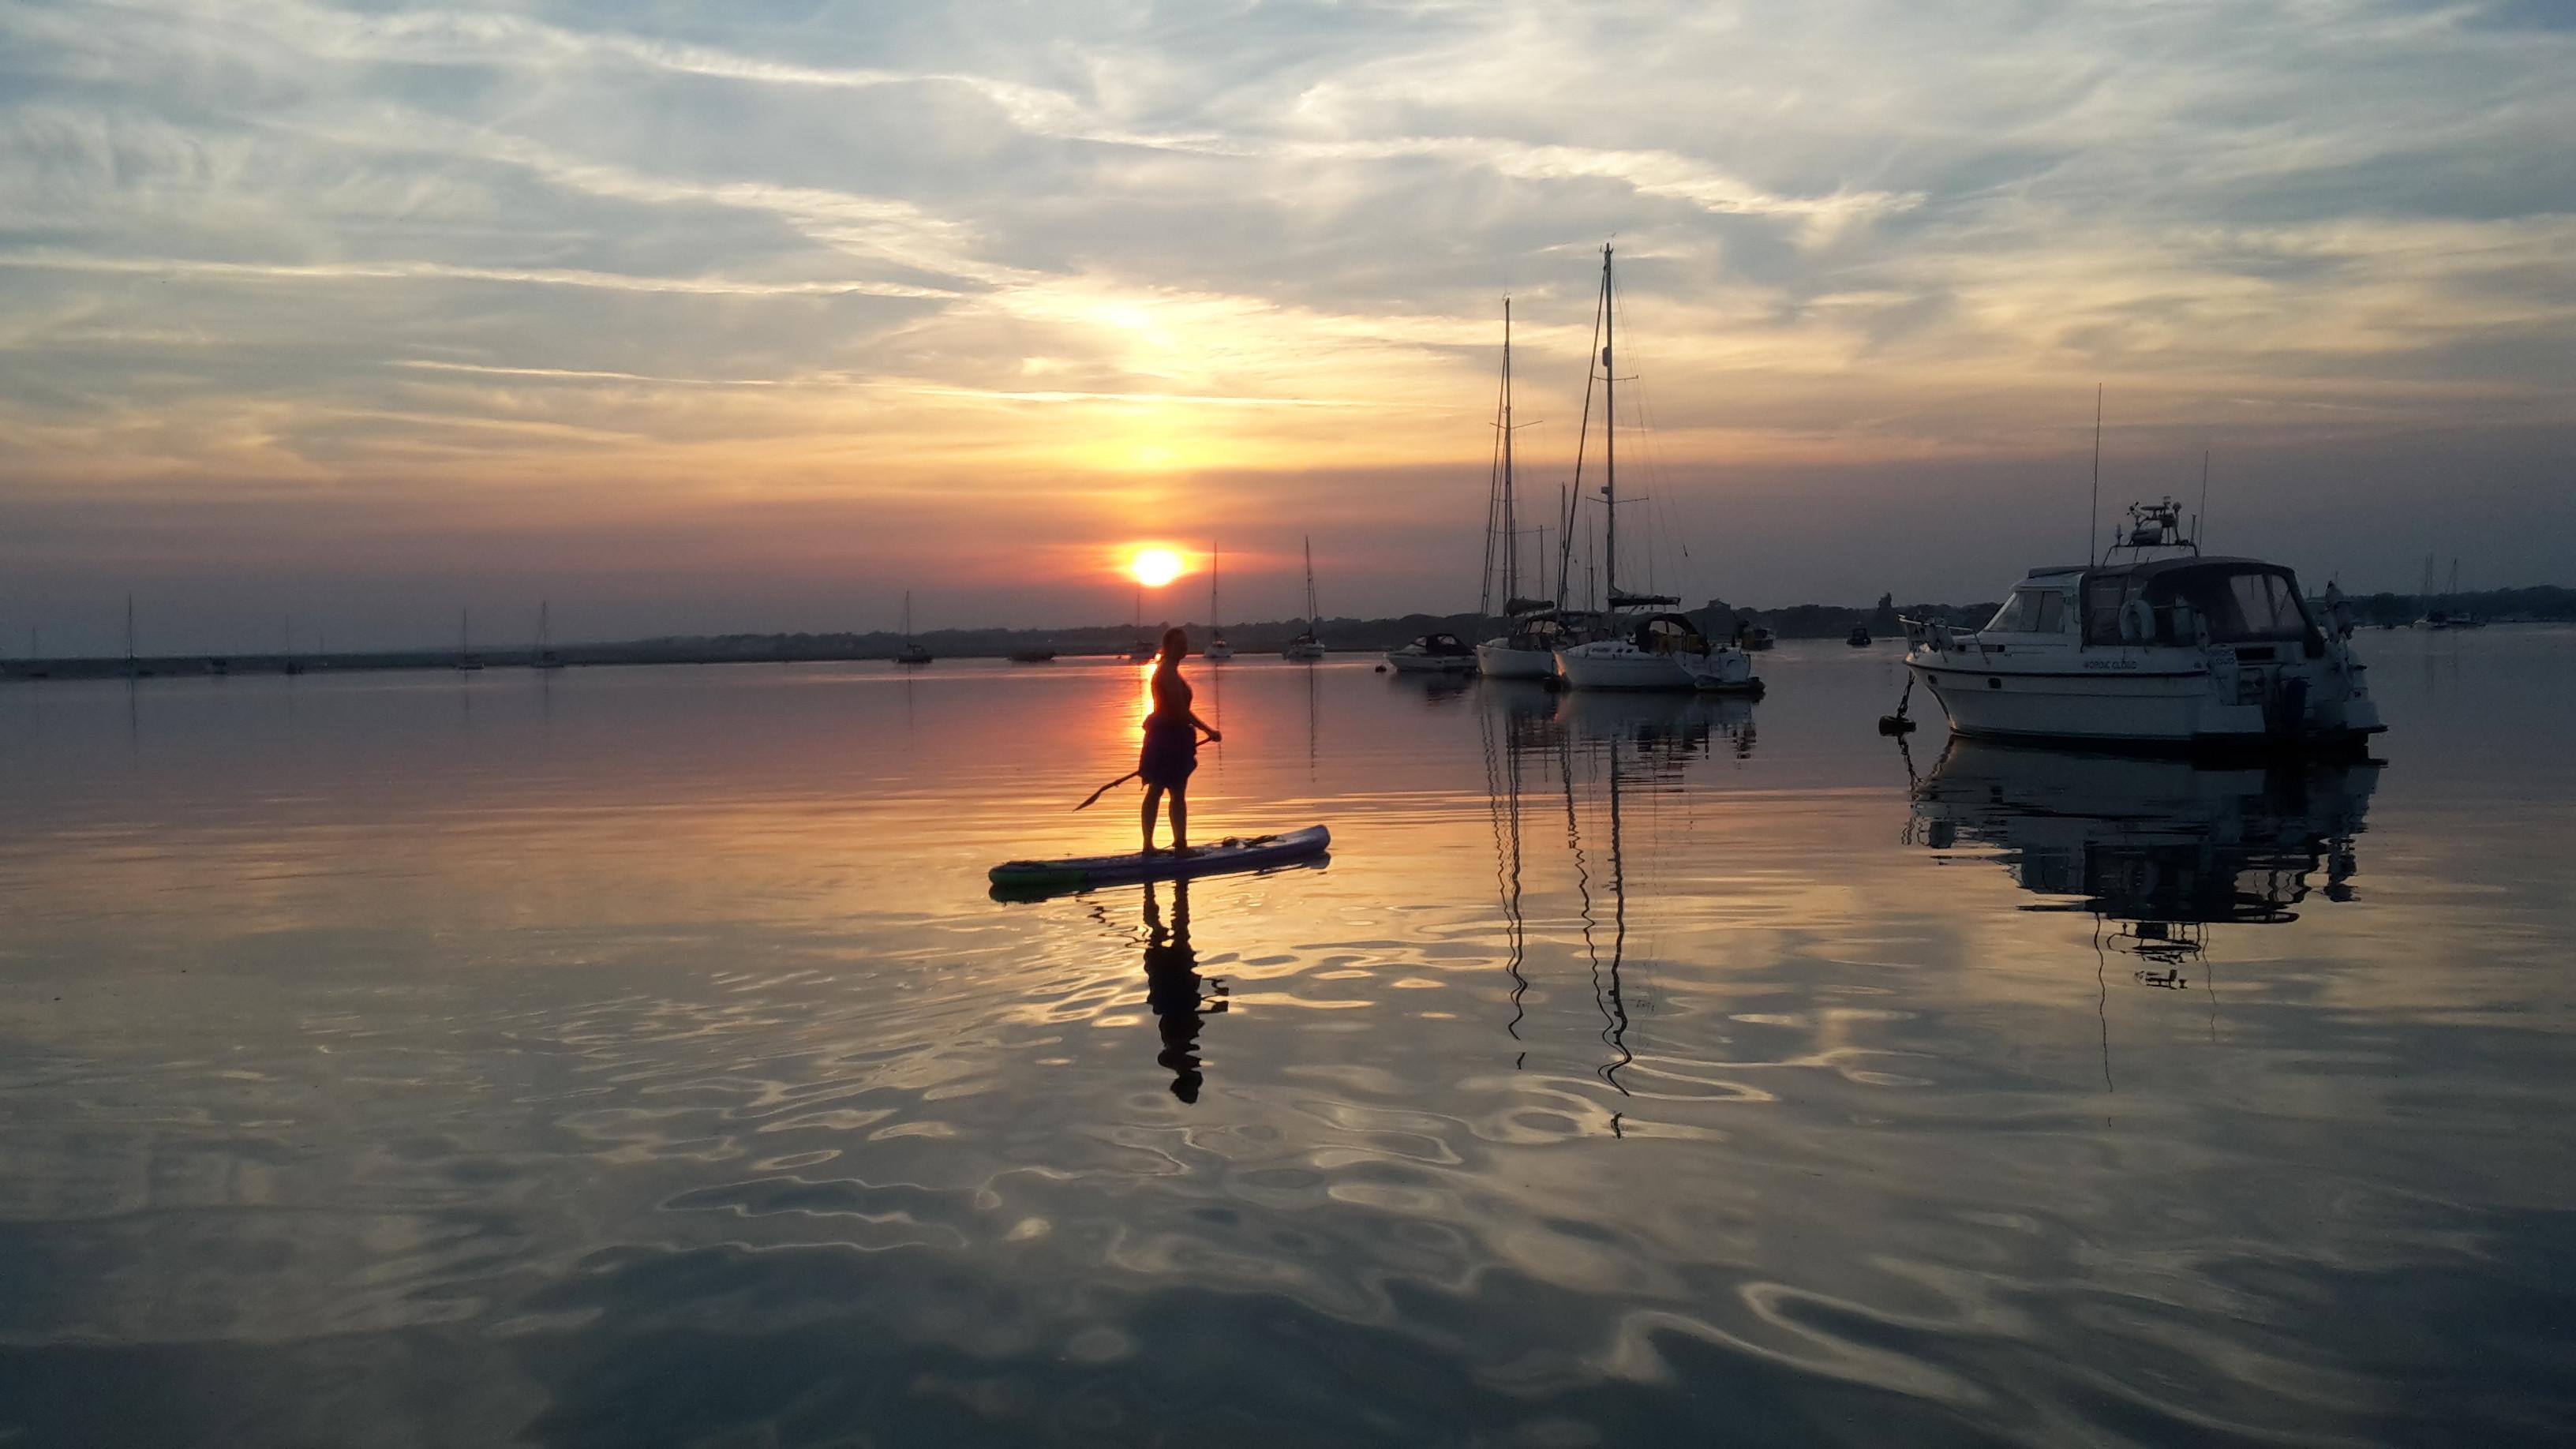 Sunset Picnic Paddle Boarding